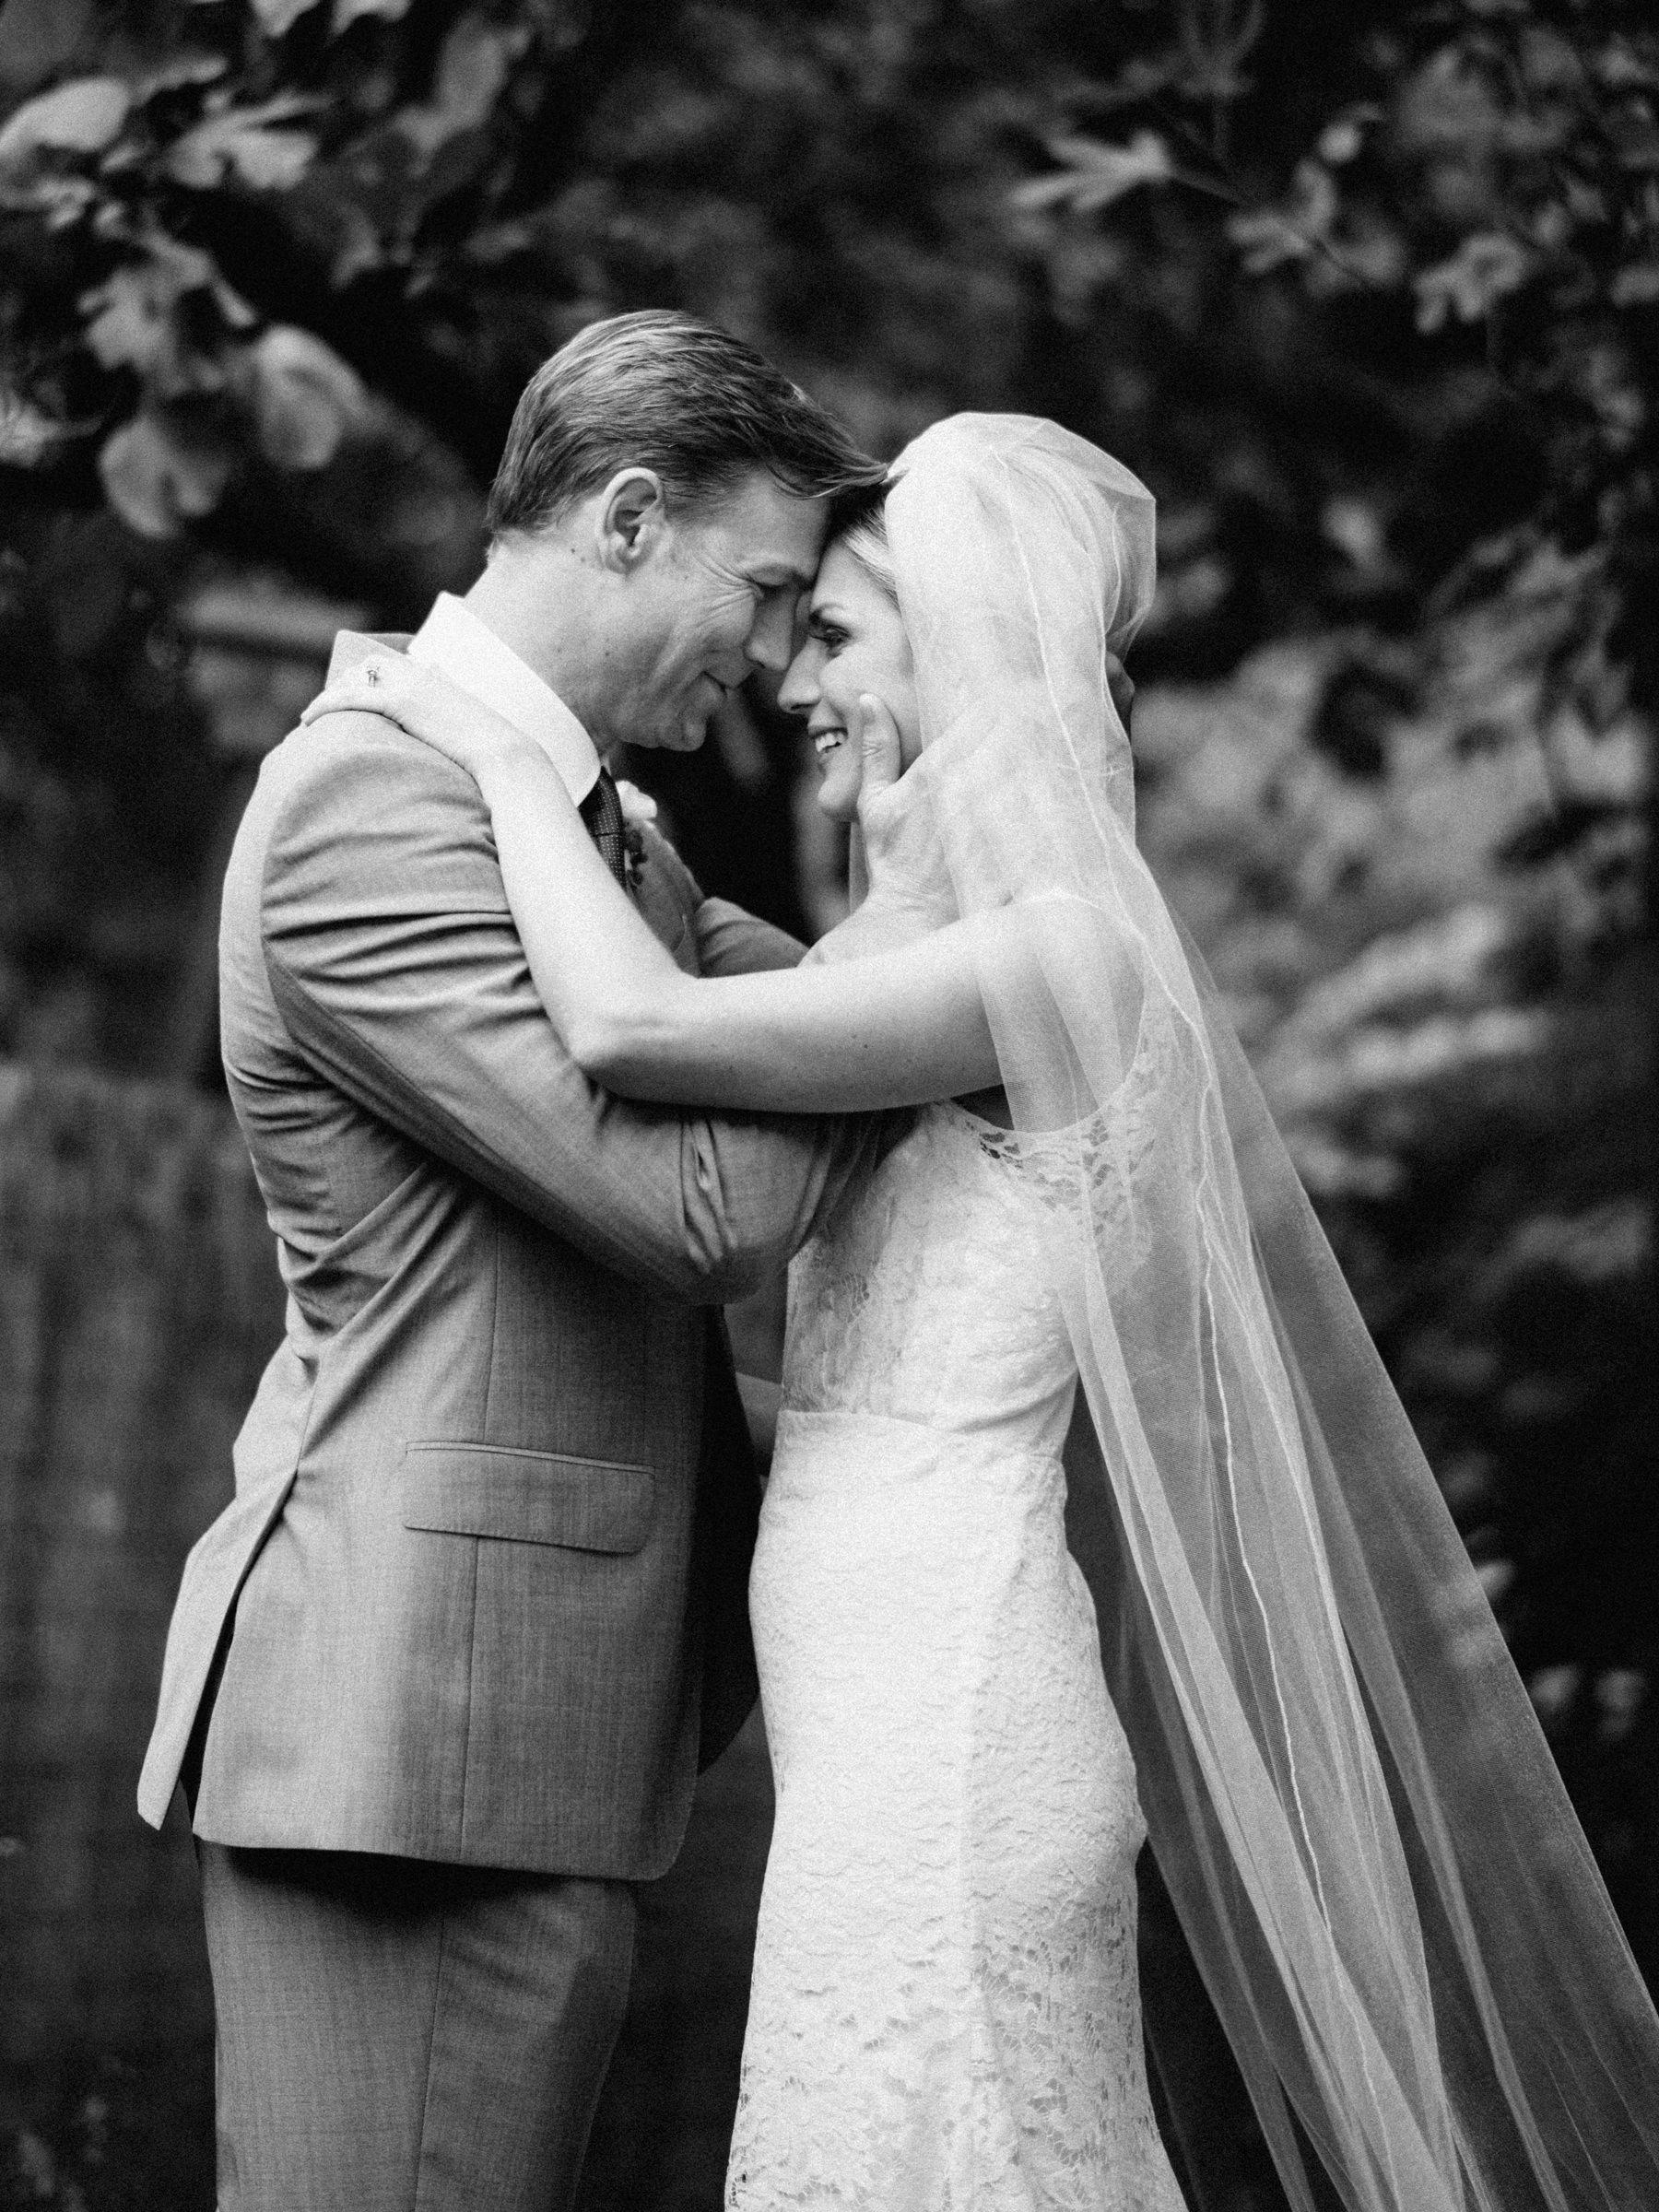 217-outdoor-wedding-ceremony-at-the-corson-building.jpg